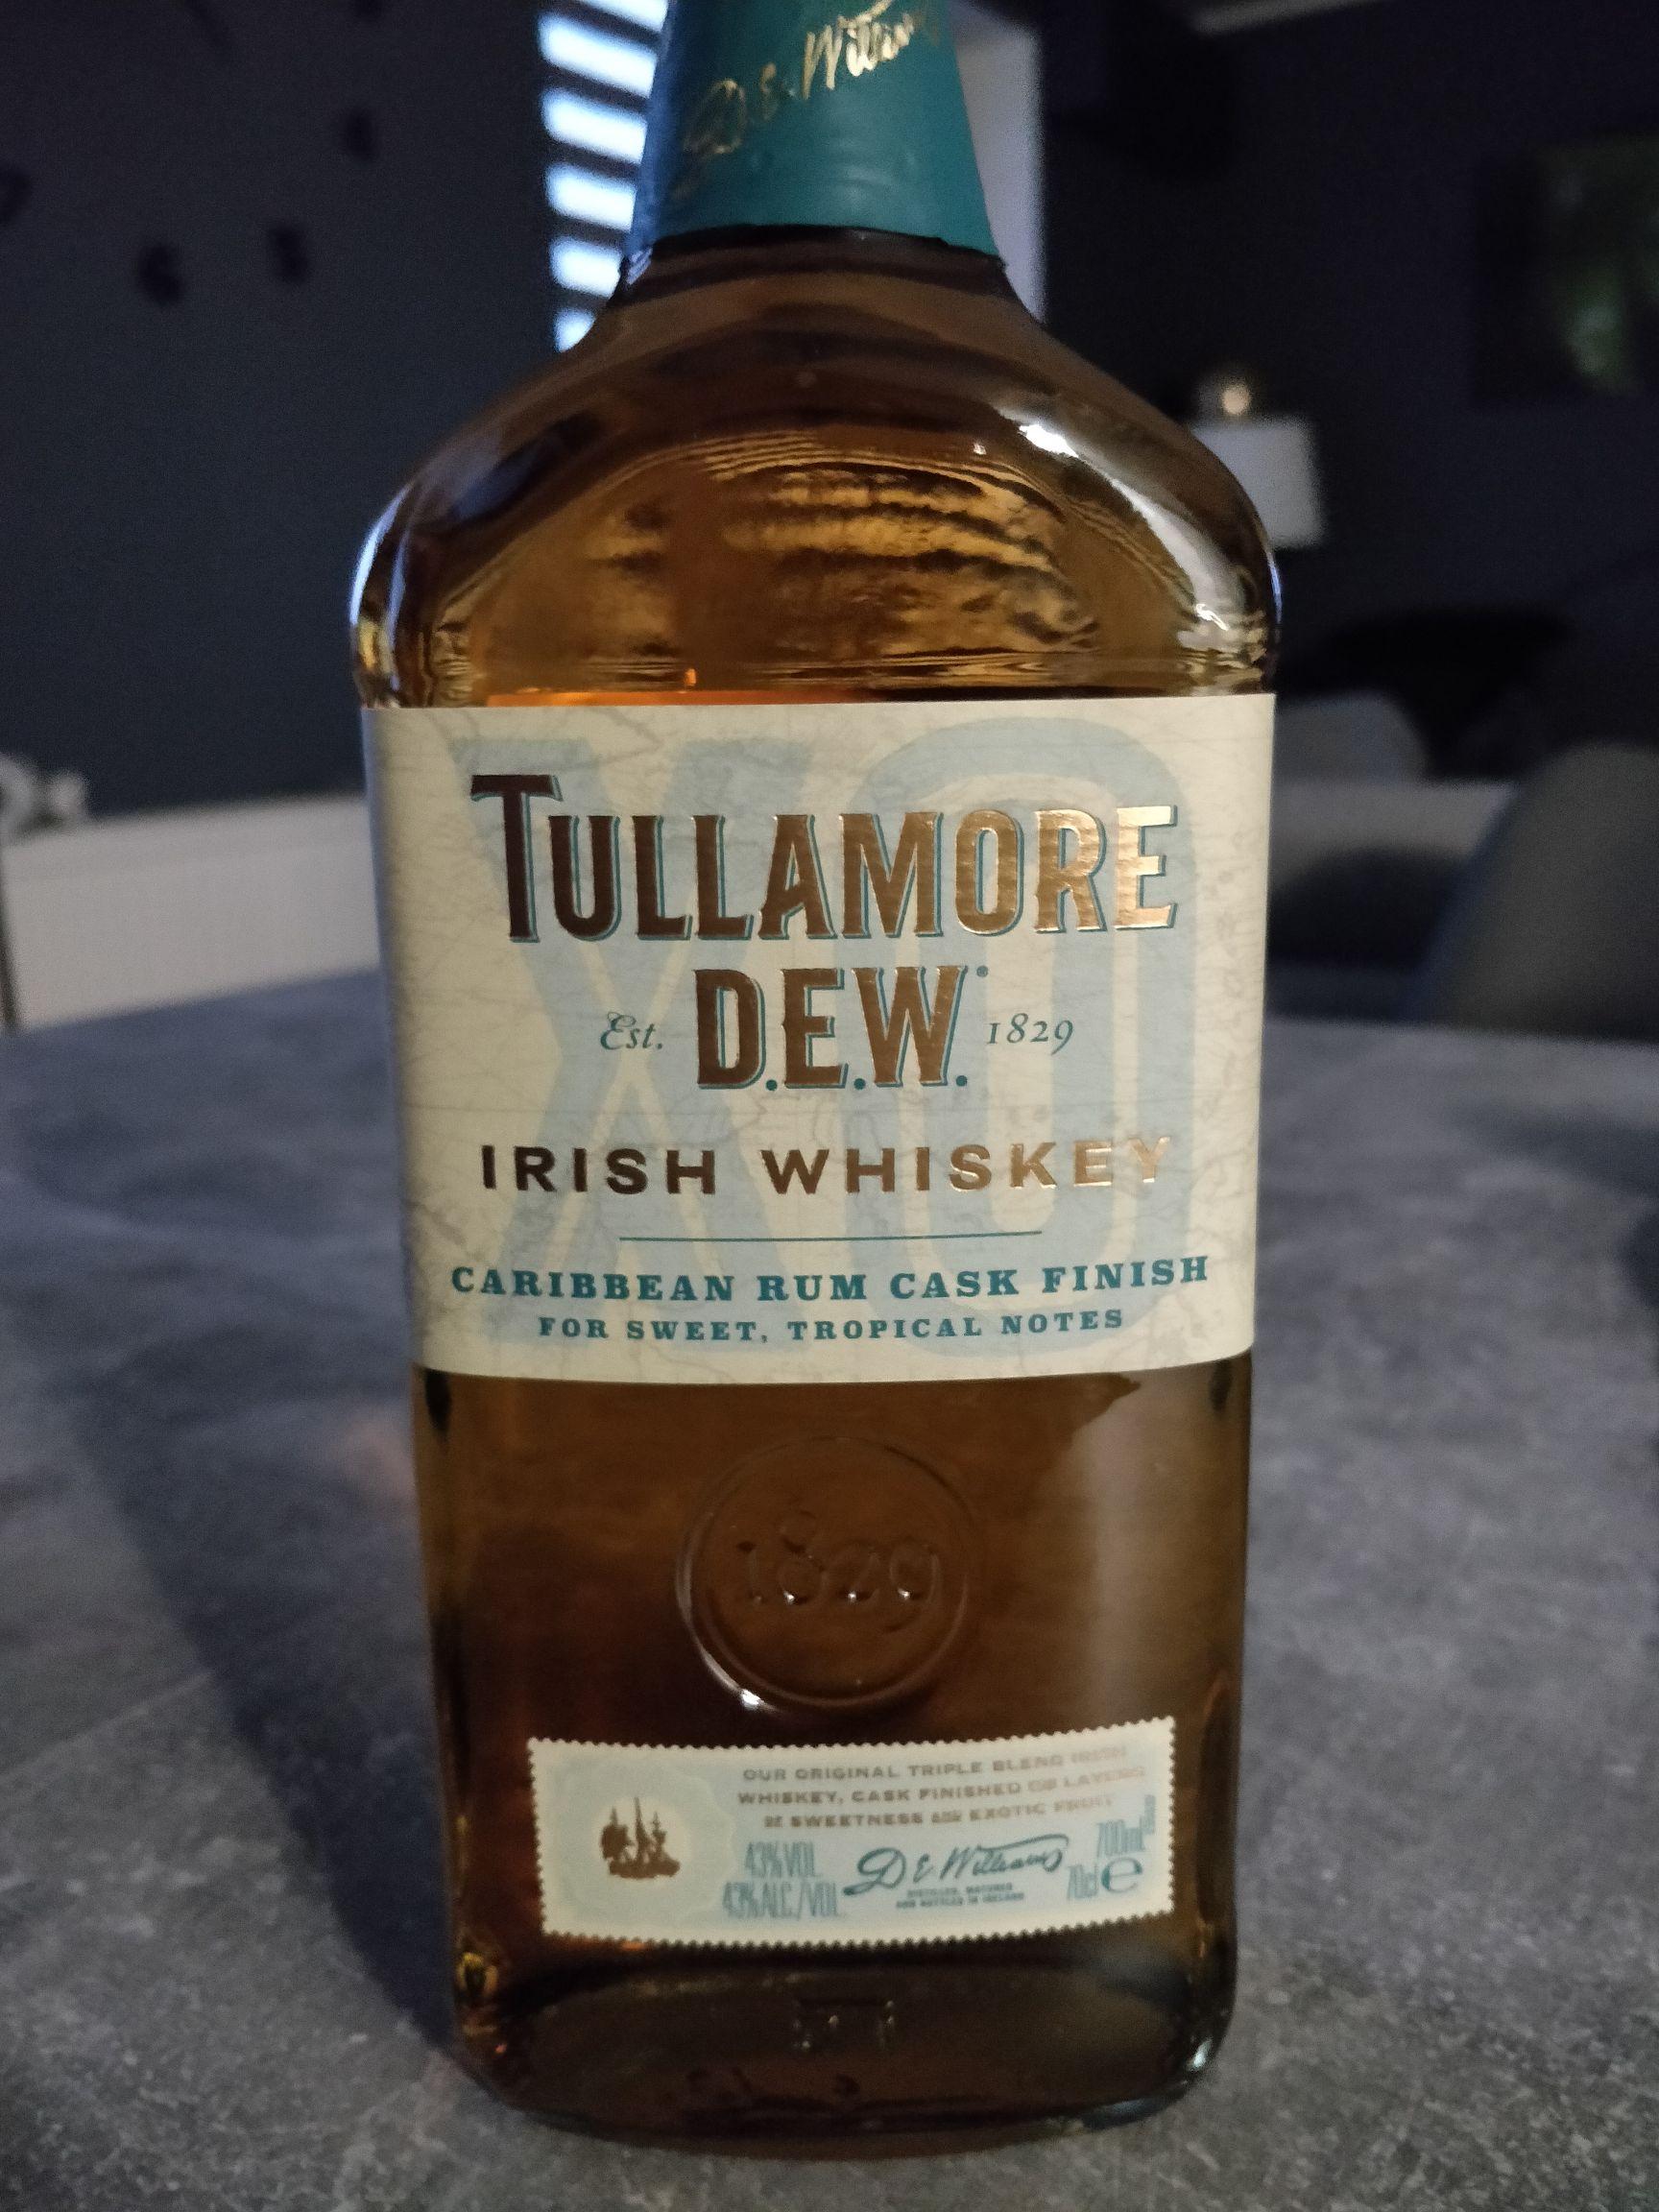 Whisky Tullamore dew Caribbean Rum Cask Finish @Biedronka